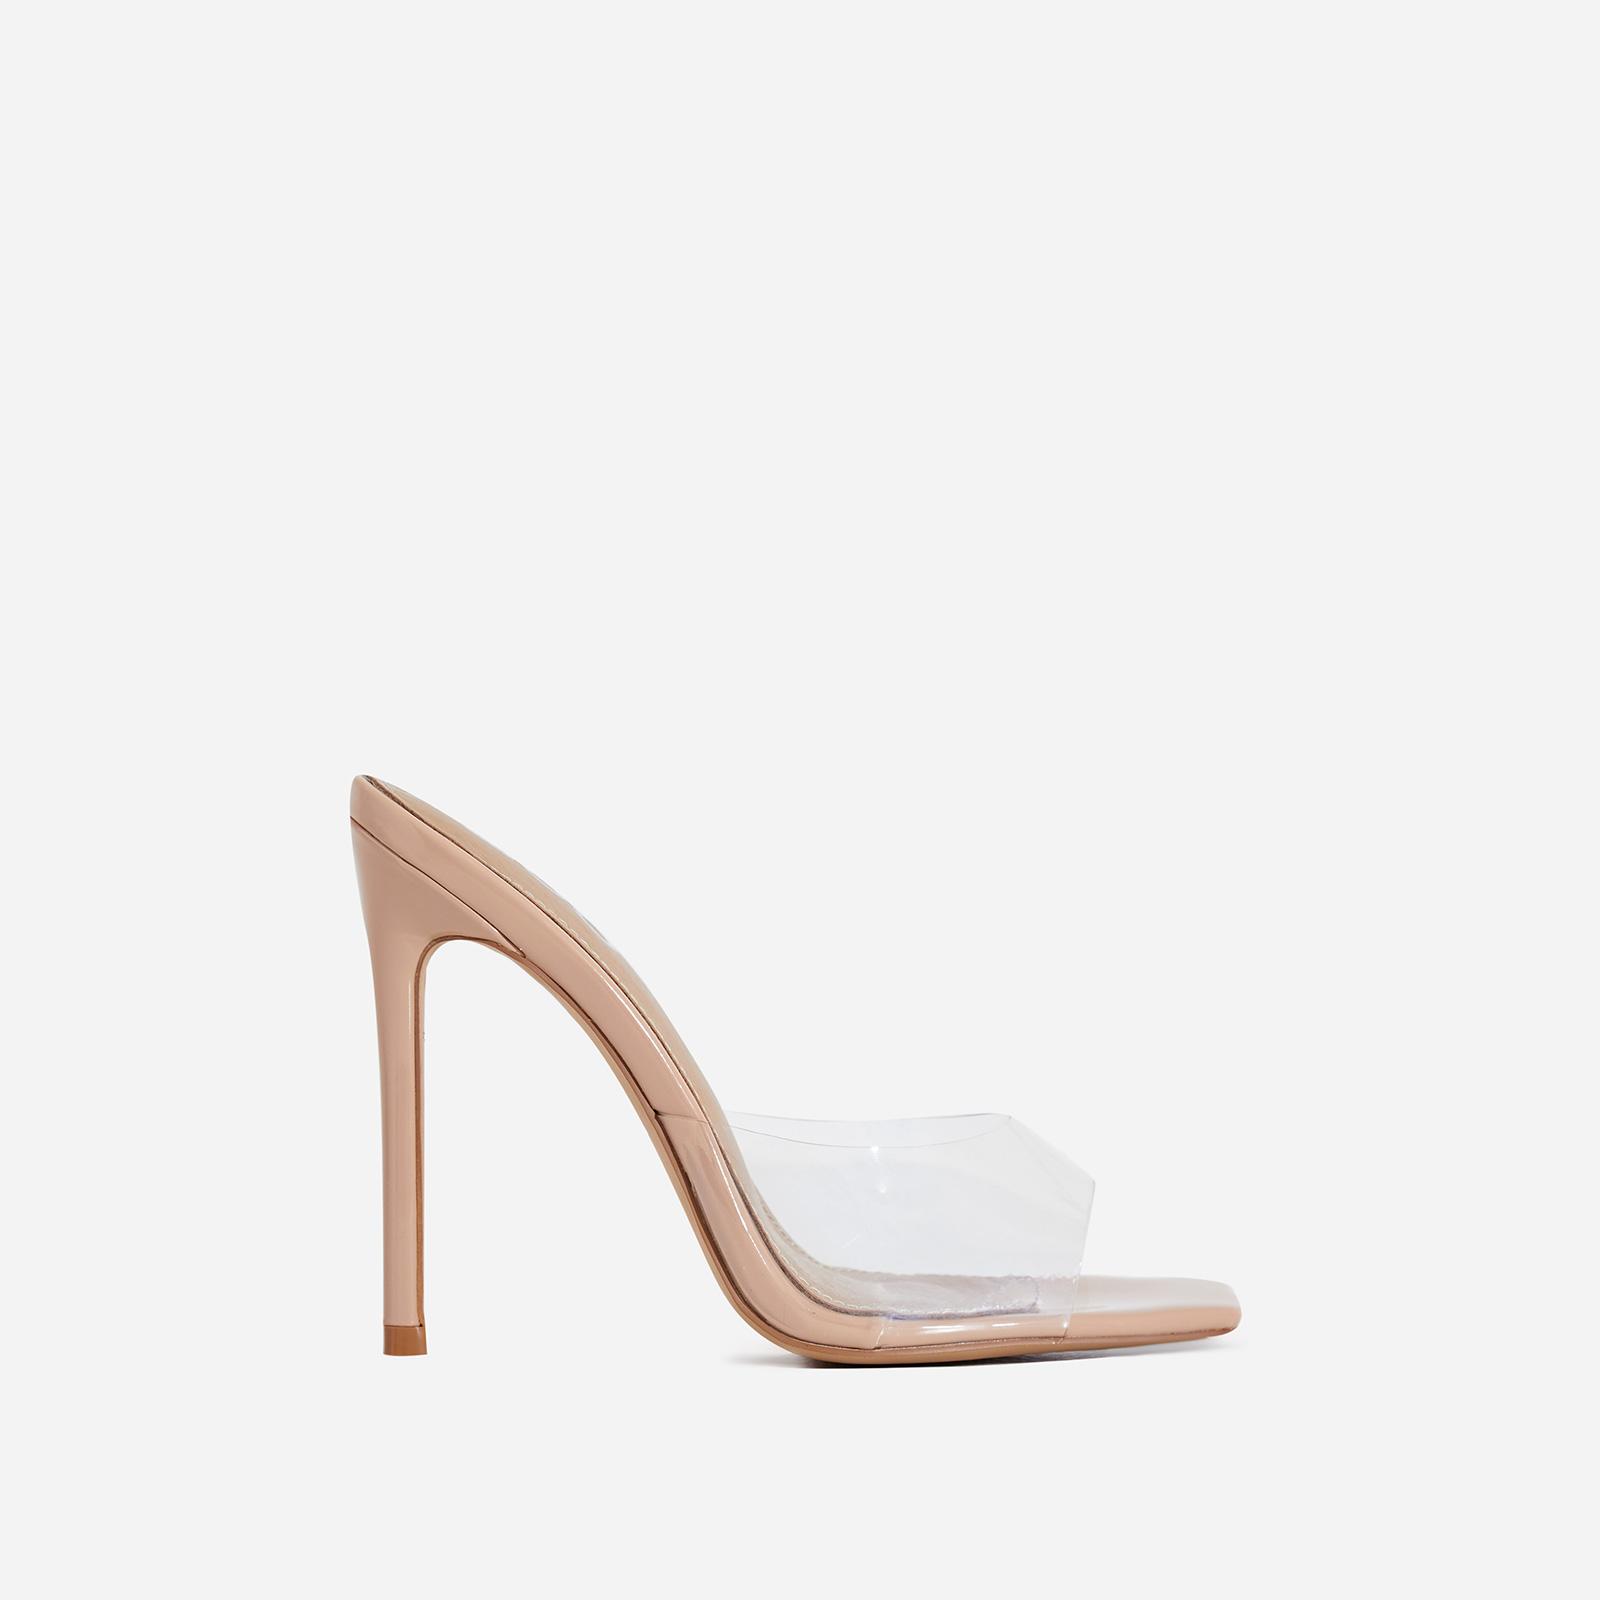 982a49097803 Cyan Square Toe Perspex Peep Toe Mule In Nude Patent